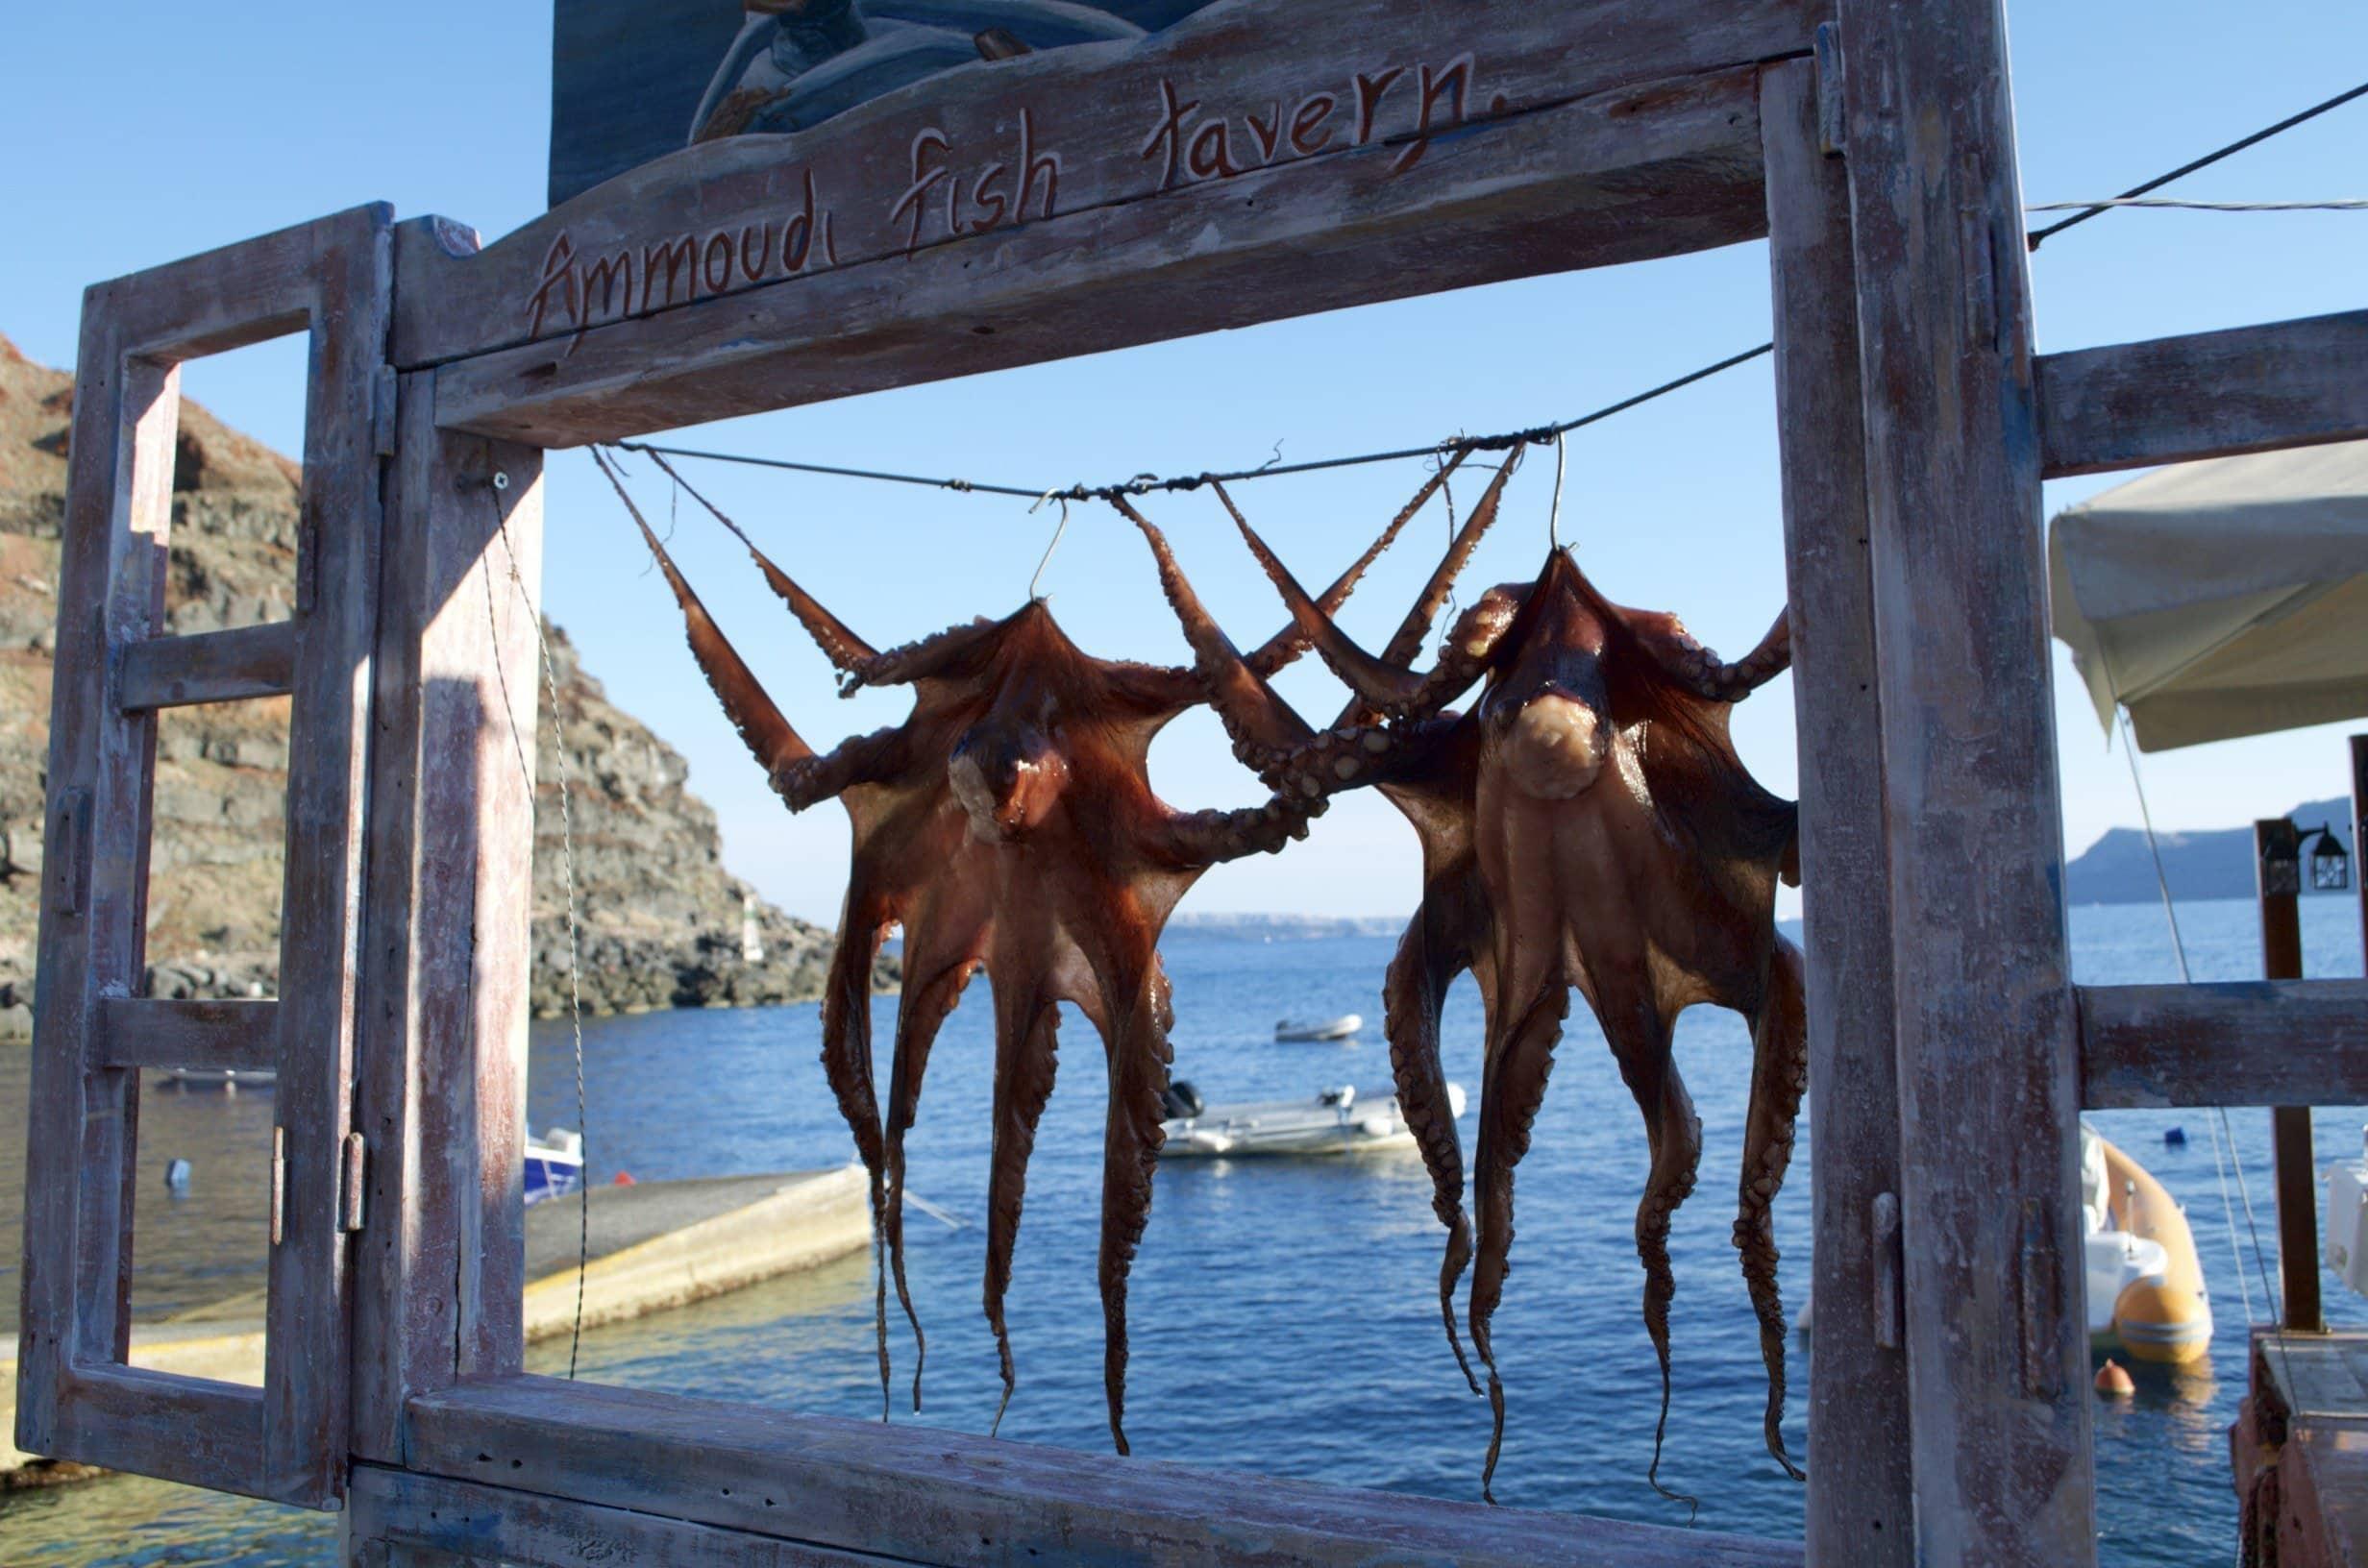 Oktopusse in der Amoudi Fish Tavern